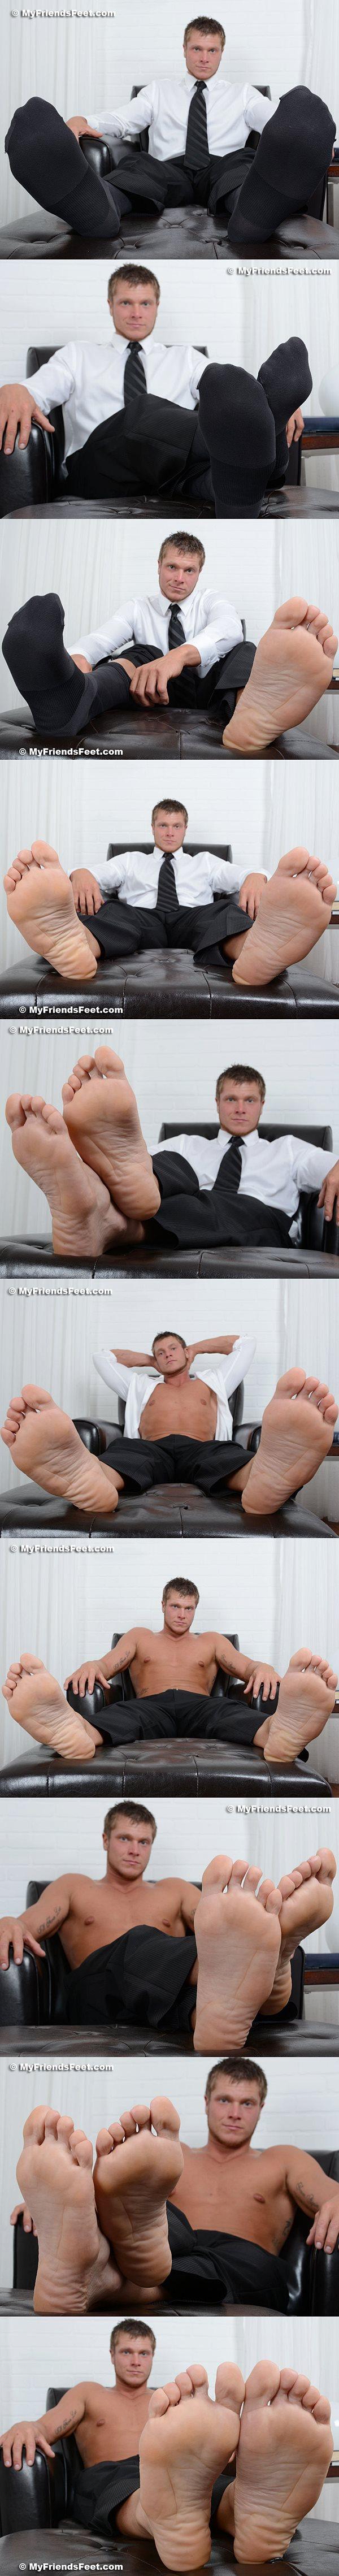 Hot blond muscle jock Powers' size 11 bare feet and dress socks at Myfriendsfeet